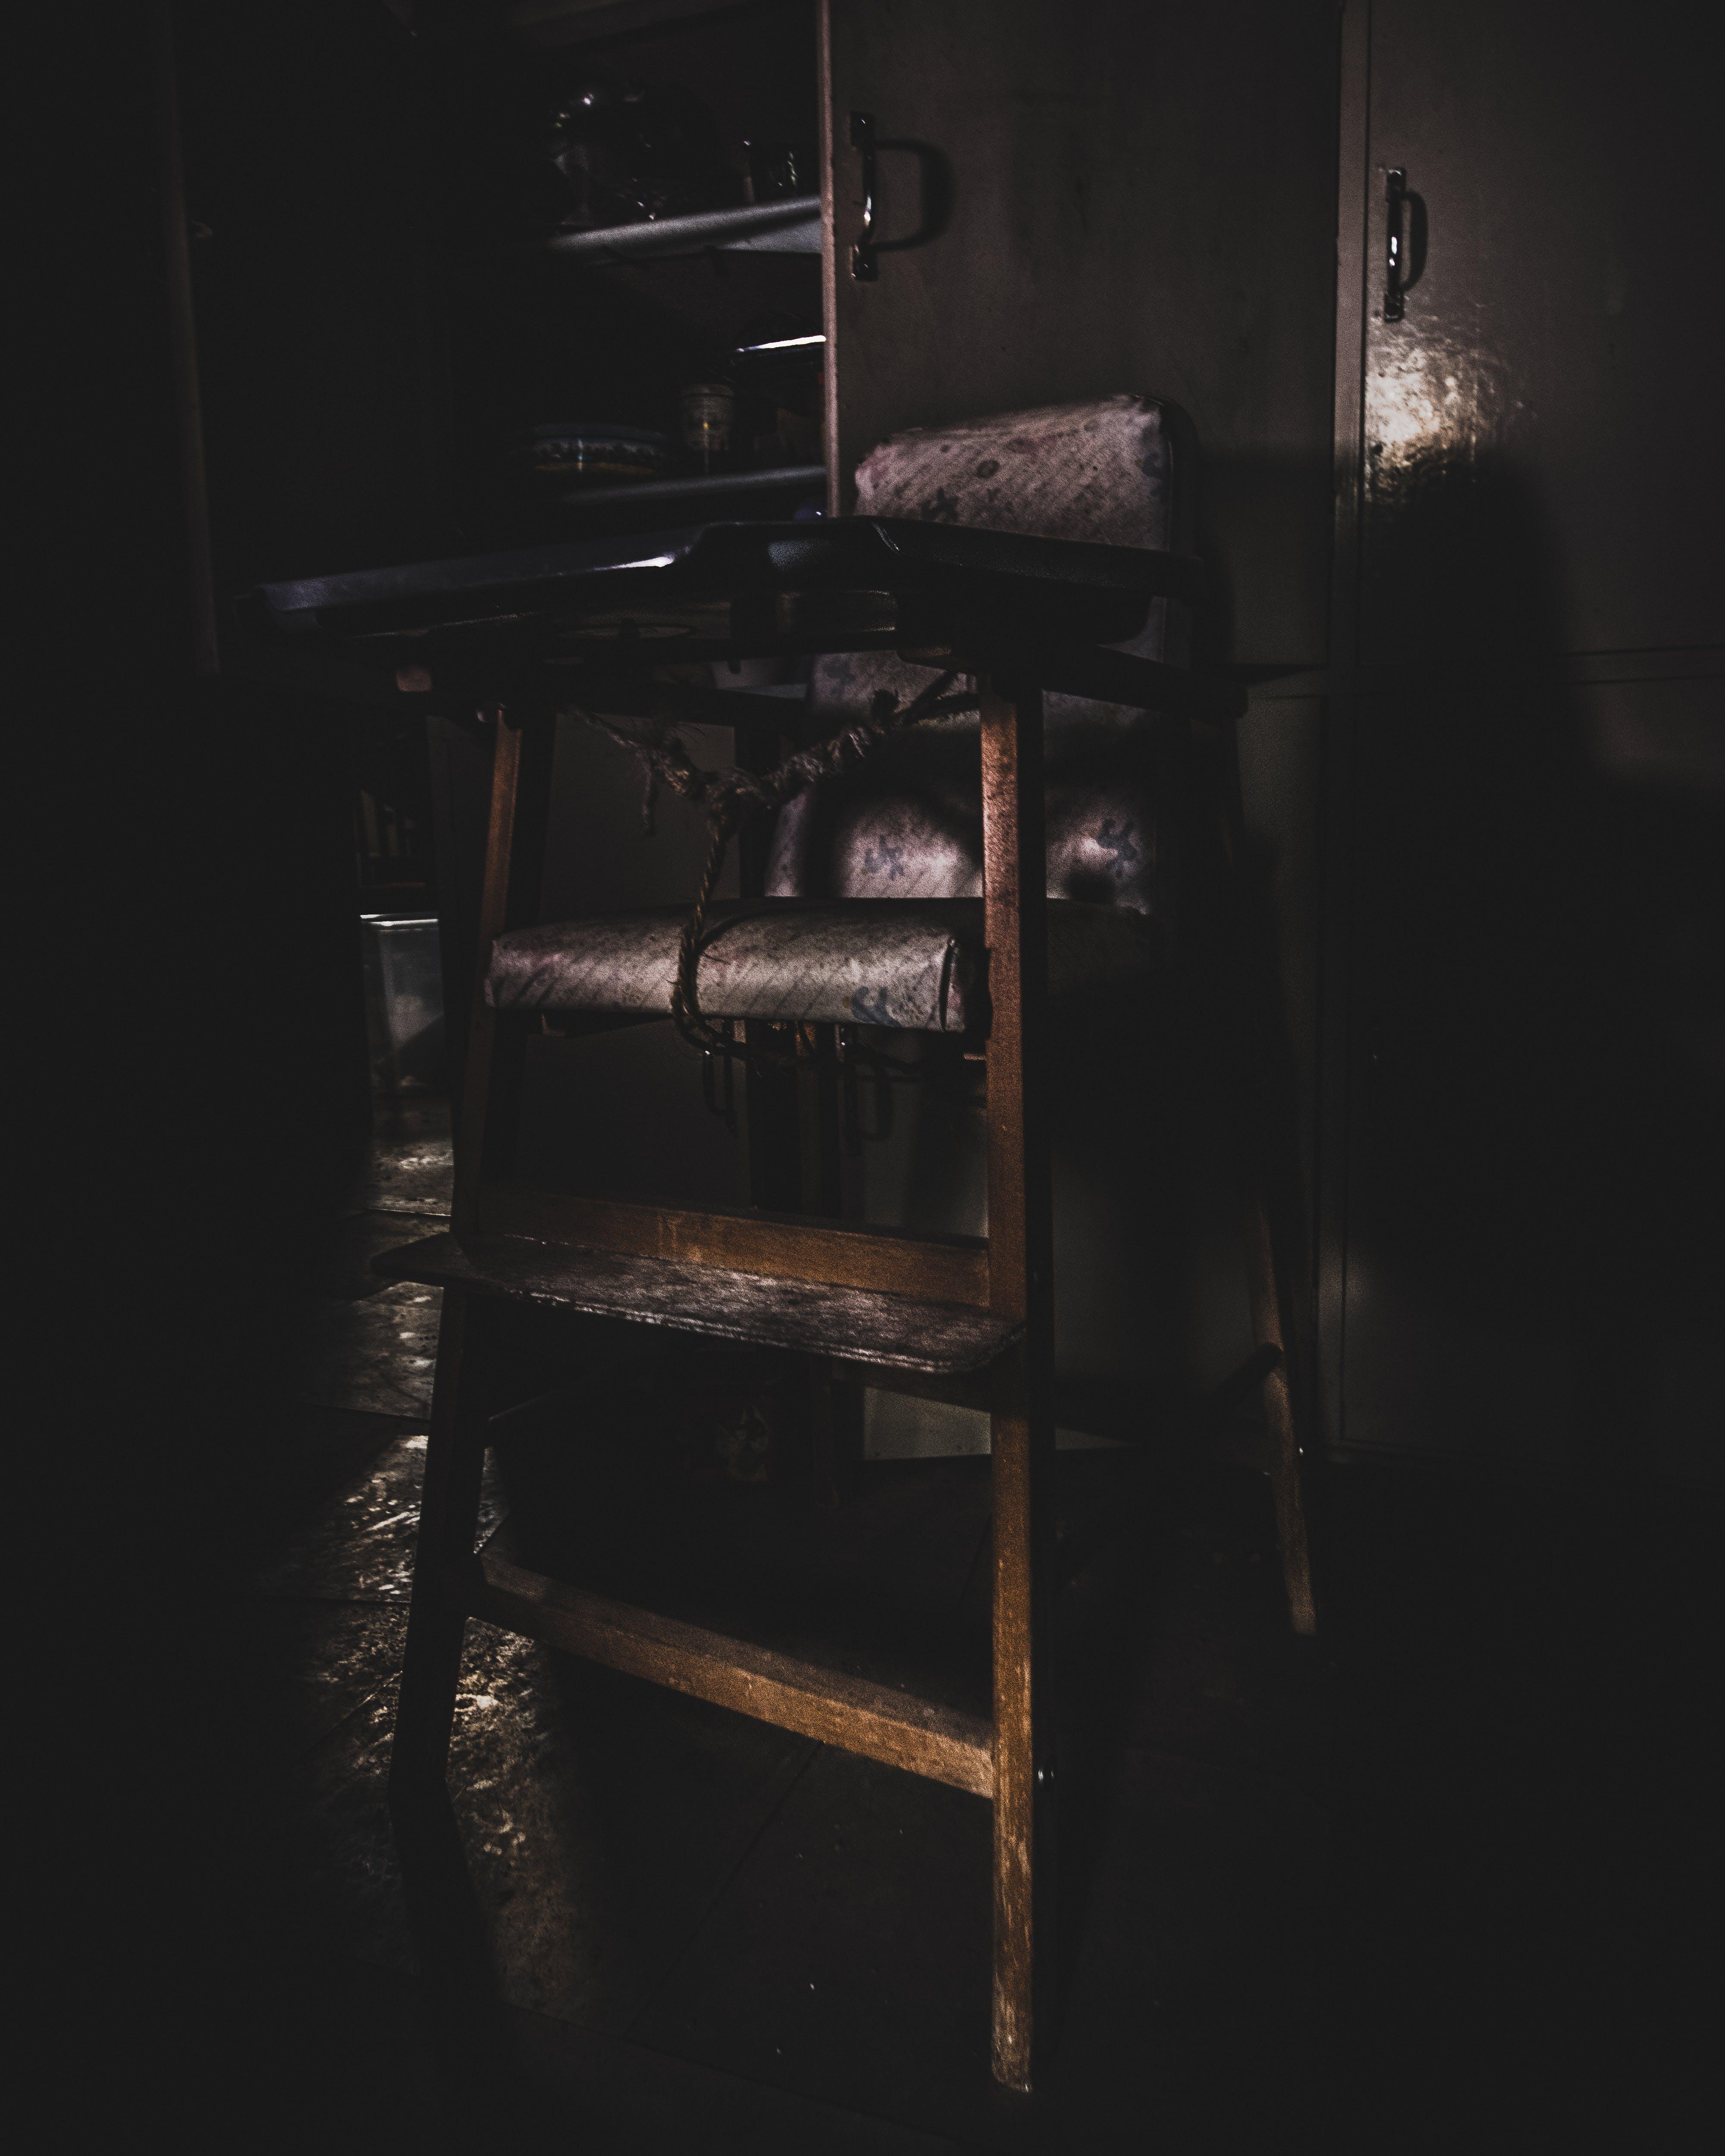 Baby's Wooden Highchair in Dim Light